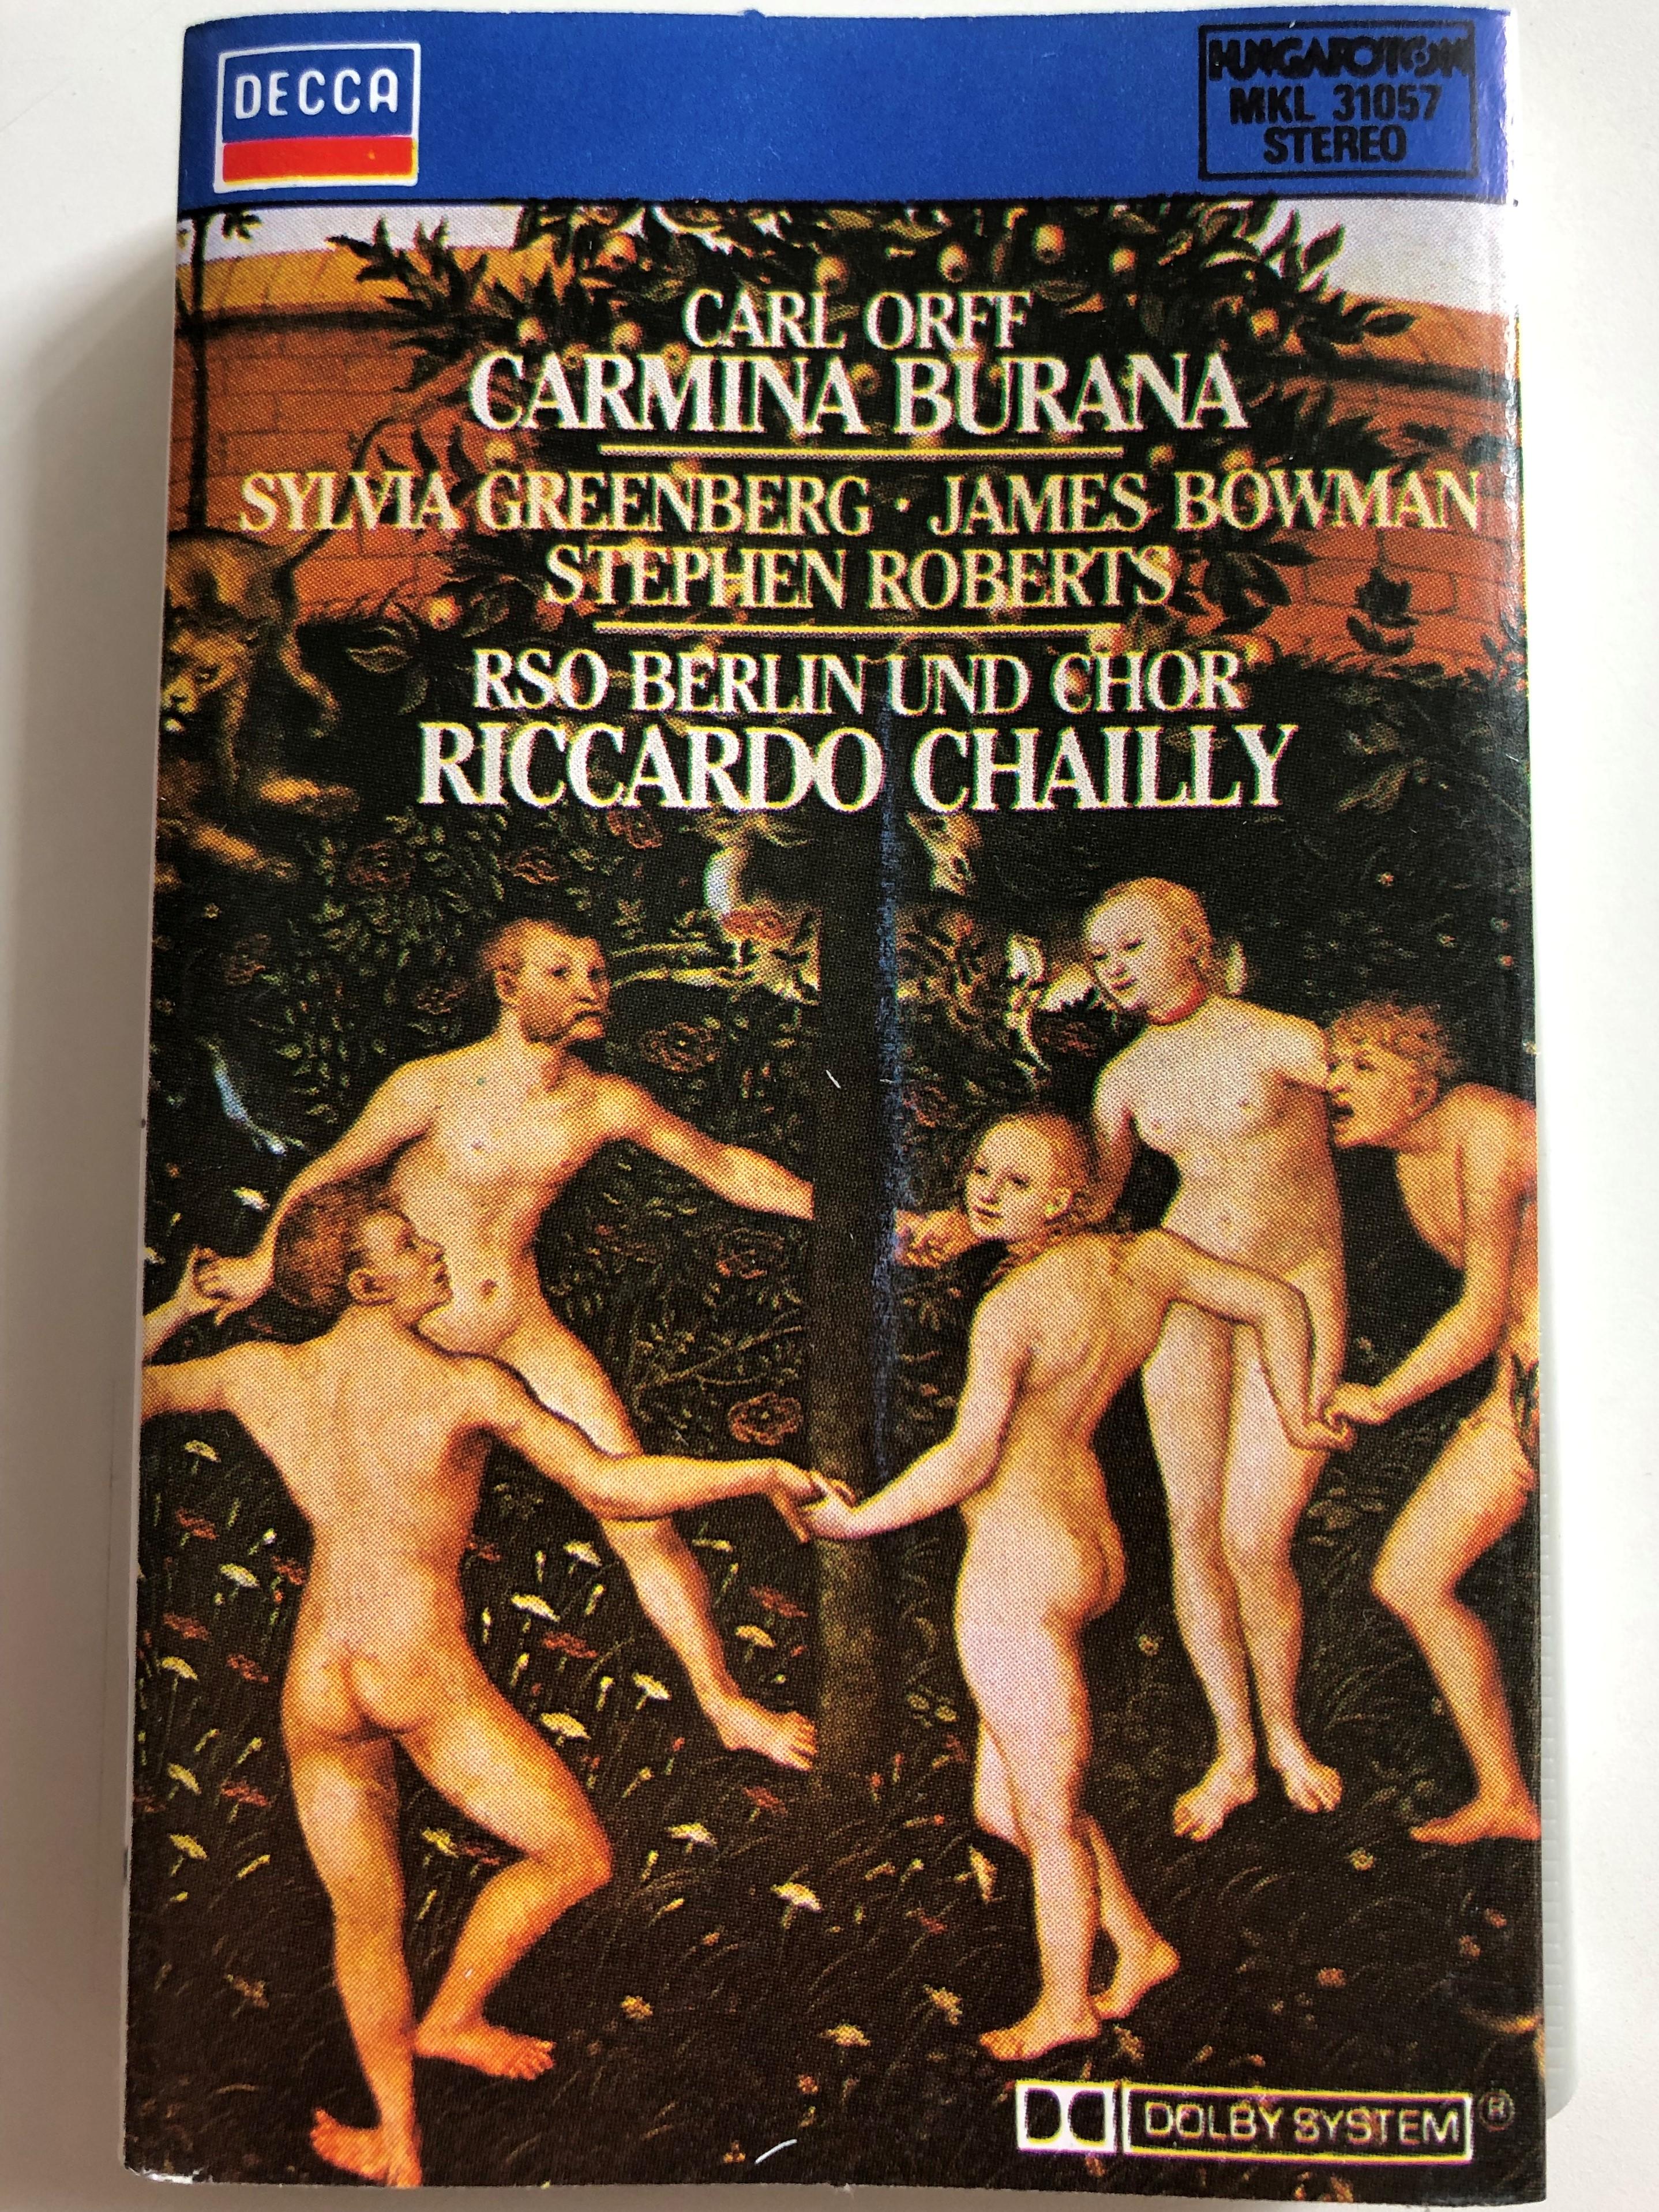 carl-orff-carmina-burana-sylvia-greenberg-james-bowman-stephen-roberts-rso-berlin-und-chor-conducted-riccardo-chailly-hungaroton-cassette-stereo-mkl-31057-1-.jpg